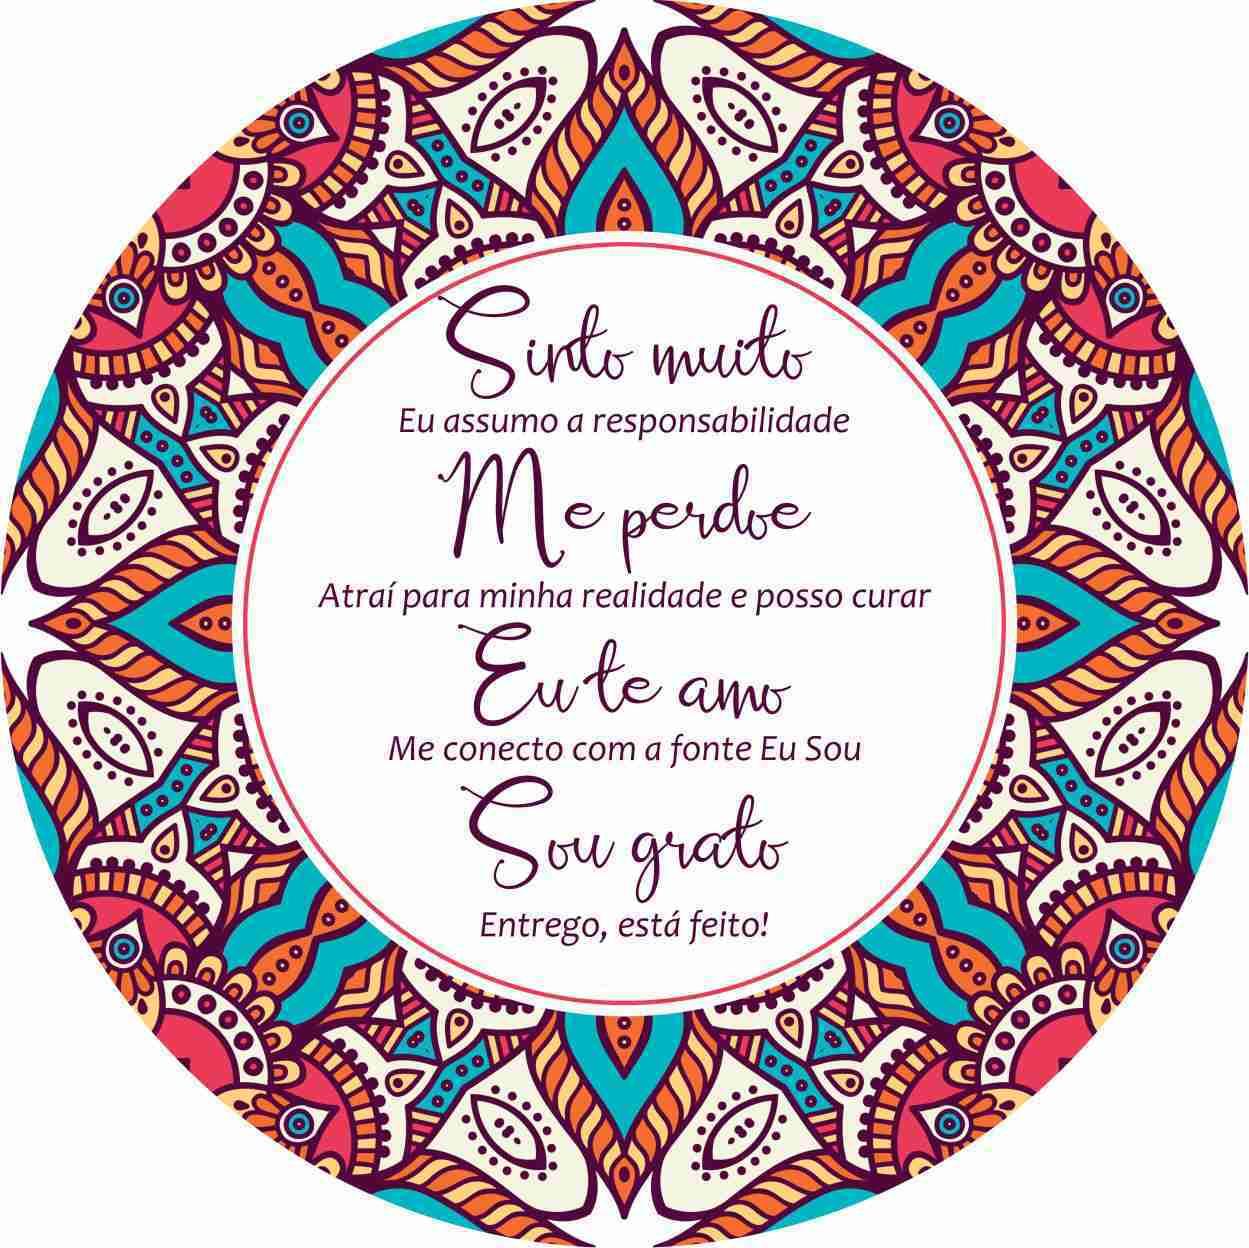 MANDALA HO'OPONOPONO: SINTO MUITO, ME PERDOE, EU TE AMO, SOU GRATO